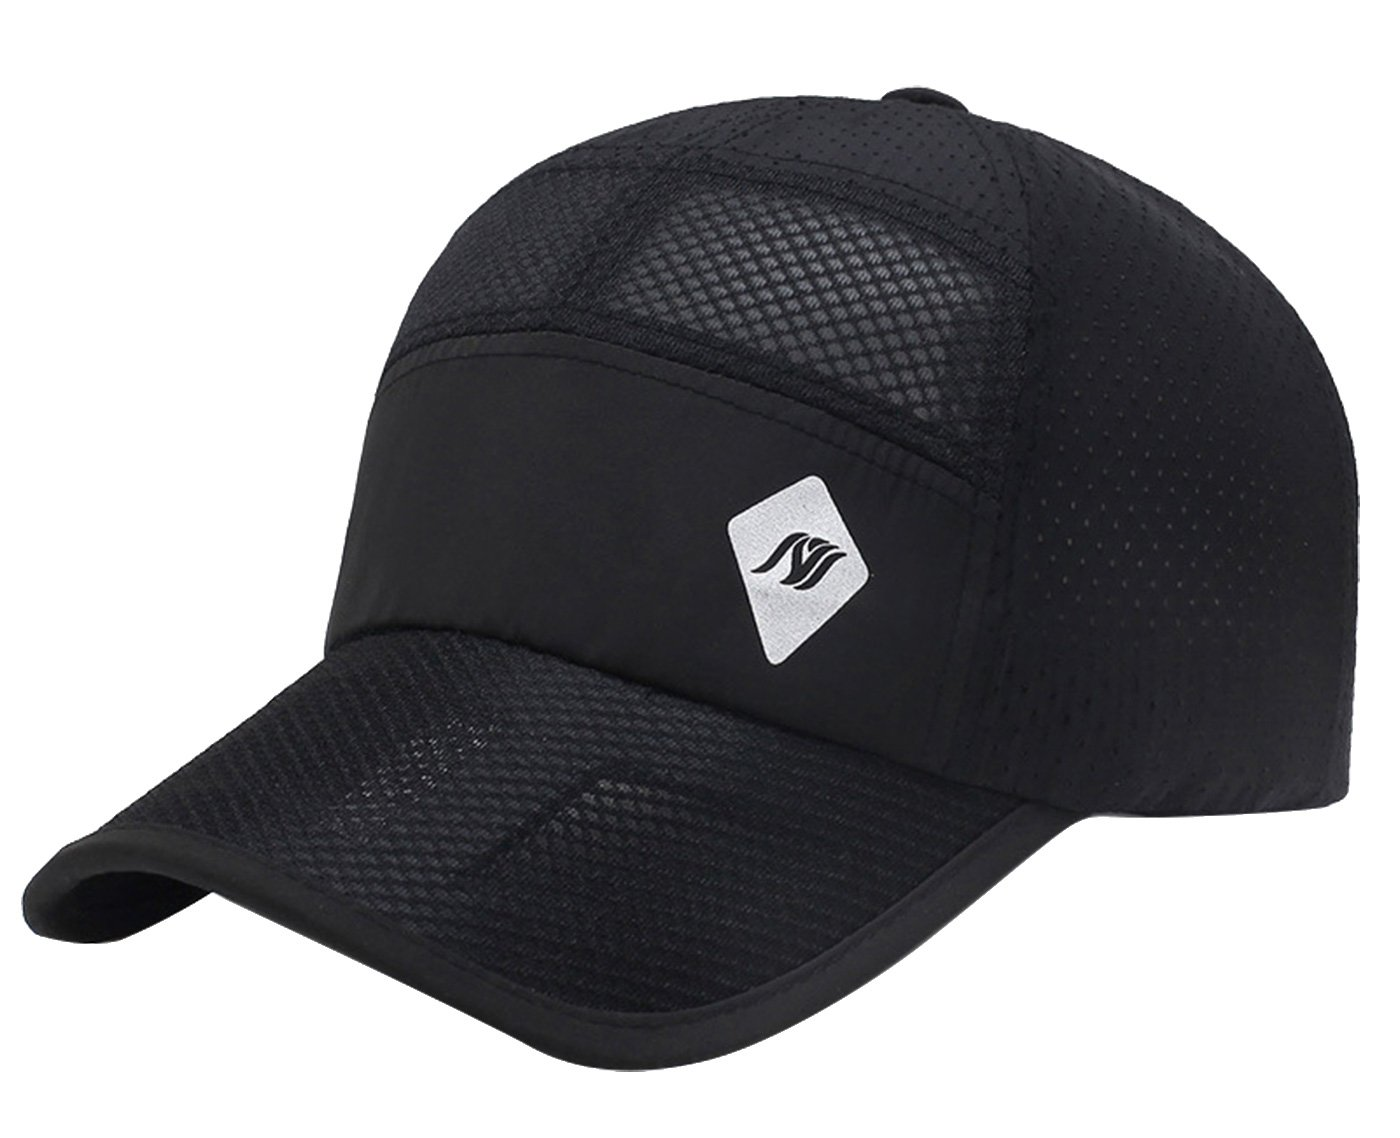 Mens Womens Outdoor Fishing Cap Sun Hat Hiking Hats for Fishing, Hiking, Mountaineering, Sports Black